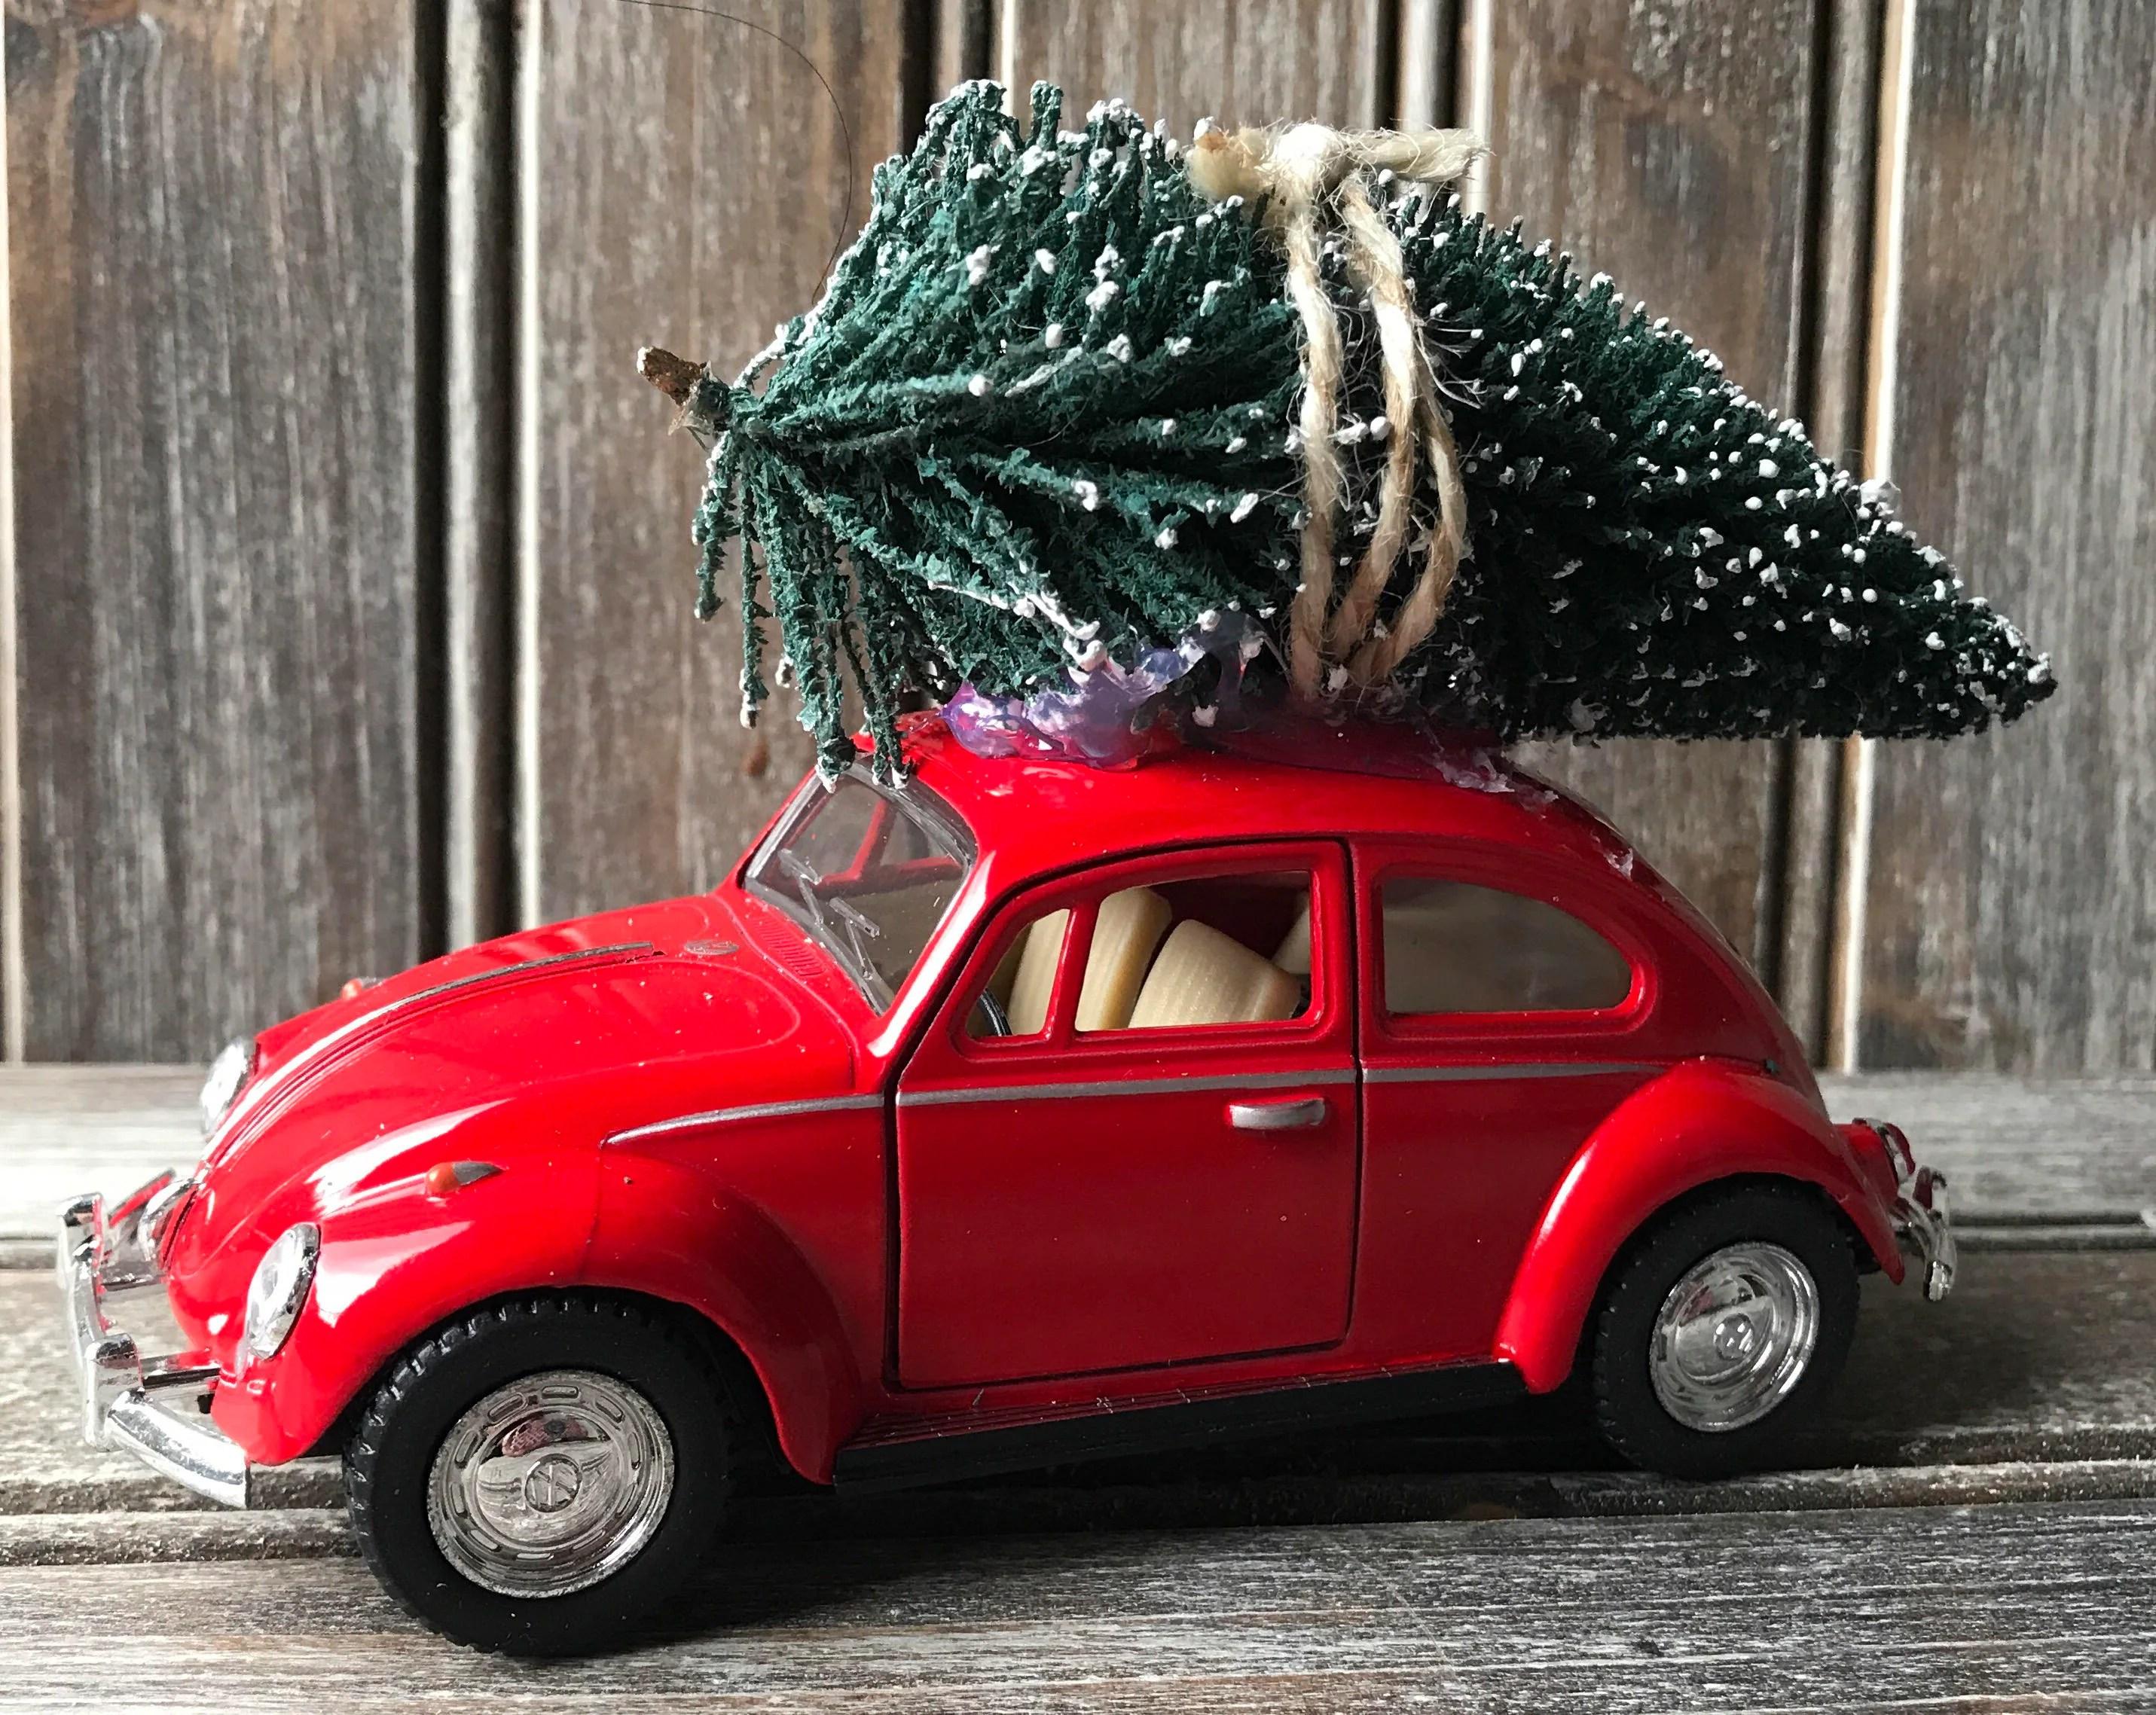 Diecast VW Bug With Christmas Tree Christmas Tree VW Beetle